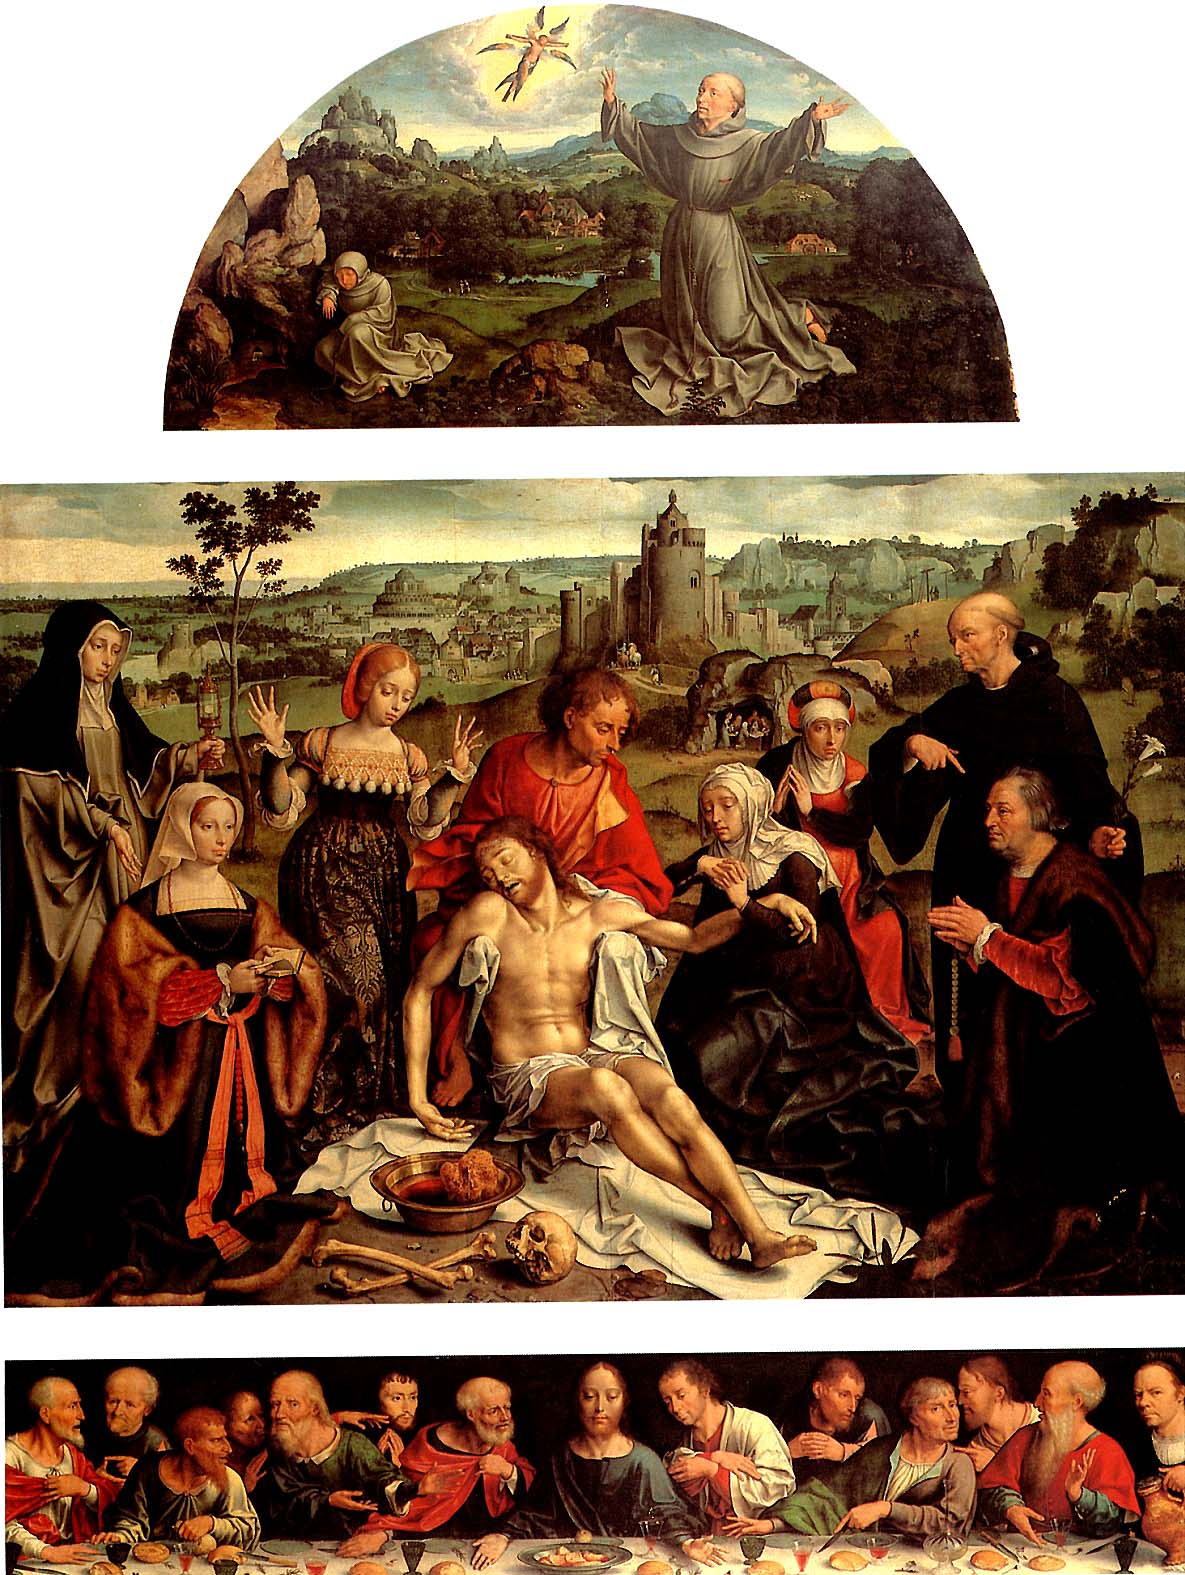 Lamentation (altarpiece) (between 1520 and 1525) (Paris, Louvre)